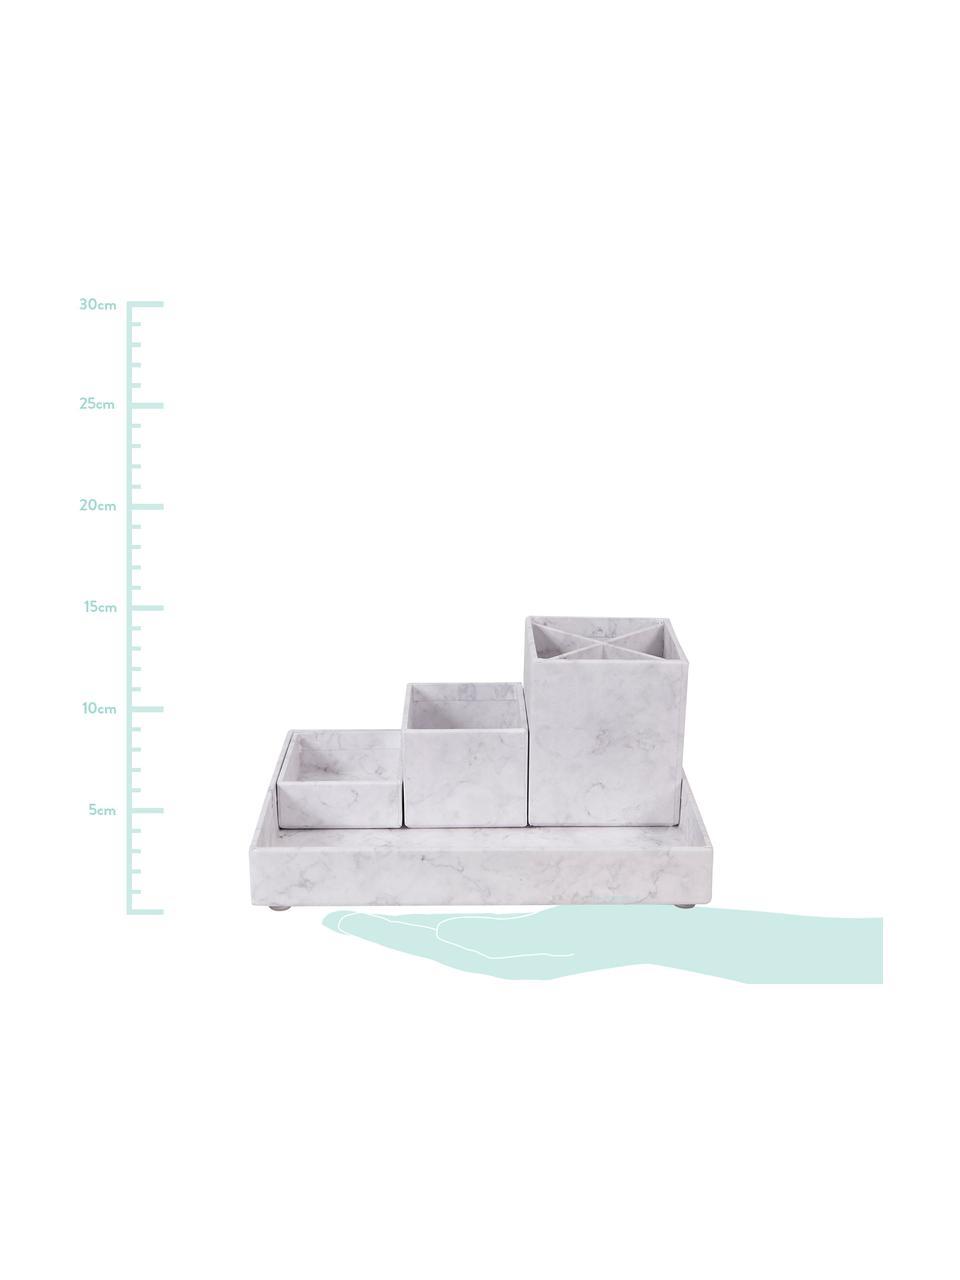 Büro-Organizer-Set Lena, 4-tlg., Fester, laminierter Karton, Weiß, marmoriert, Sondergrößen